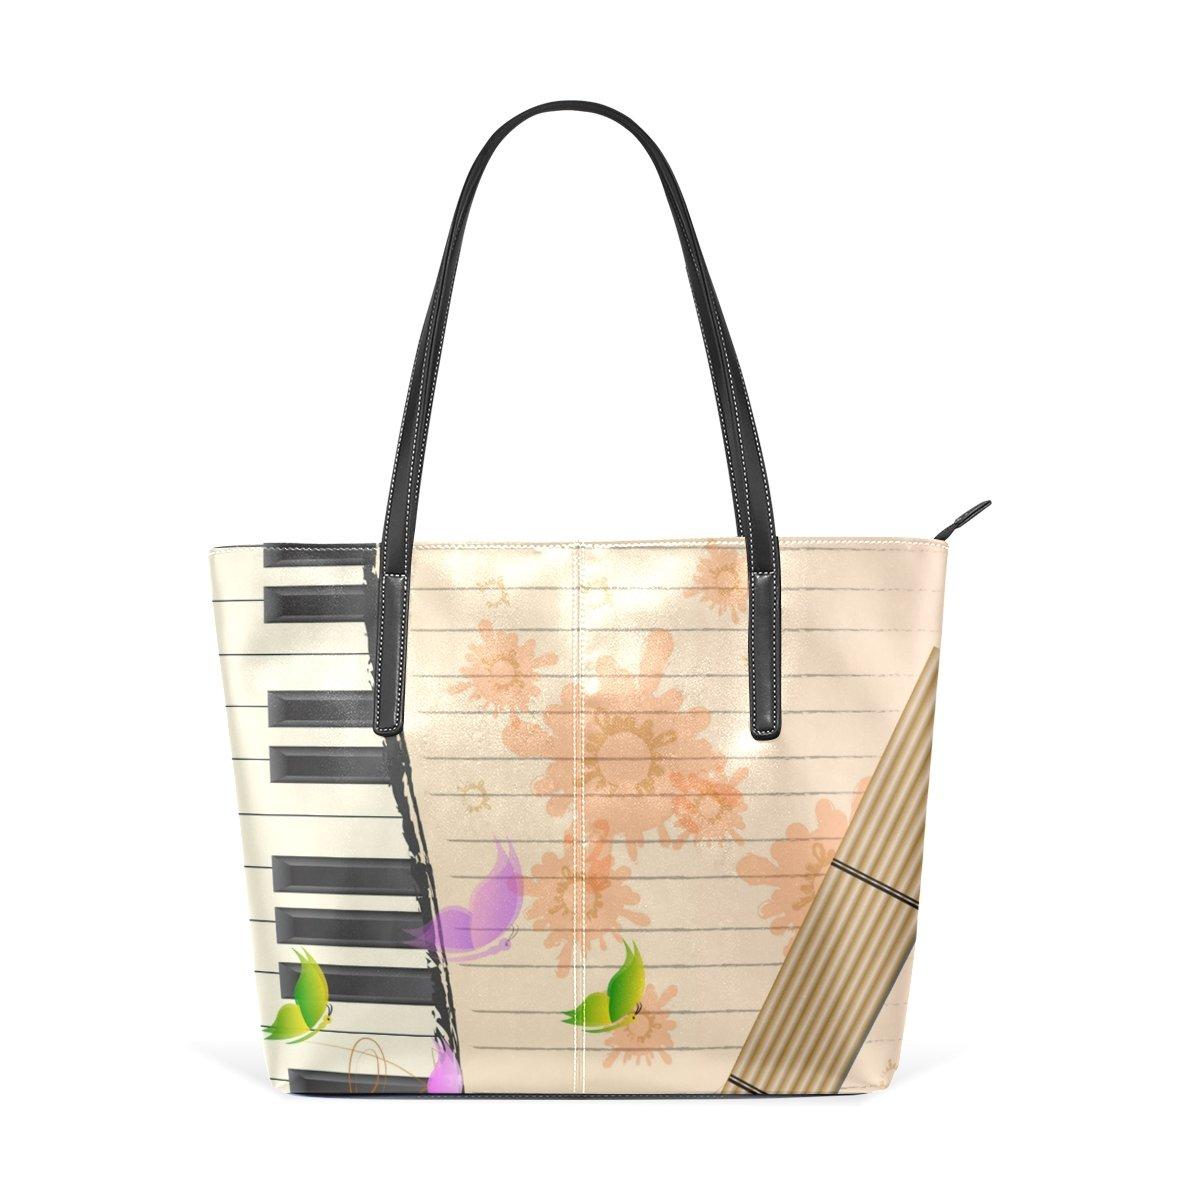 eac6622dcd9a DEYYA Women Large Tote Top Handle Shoulder Bags Music Notes ...